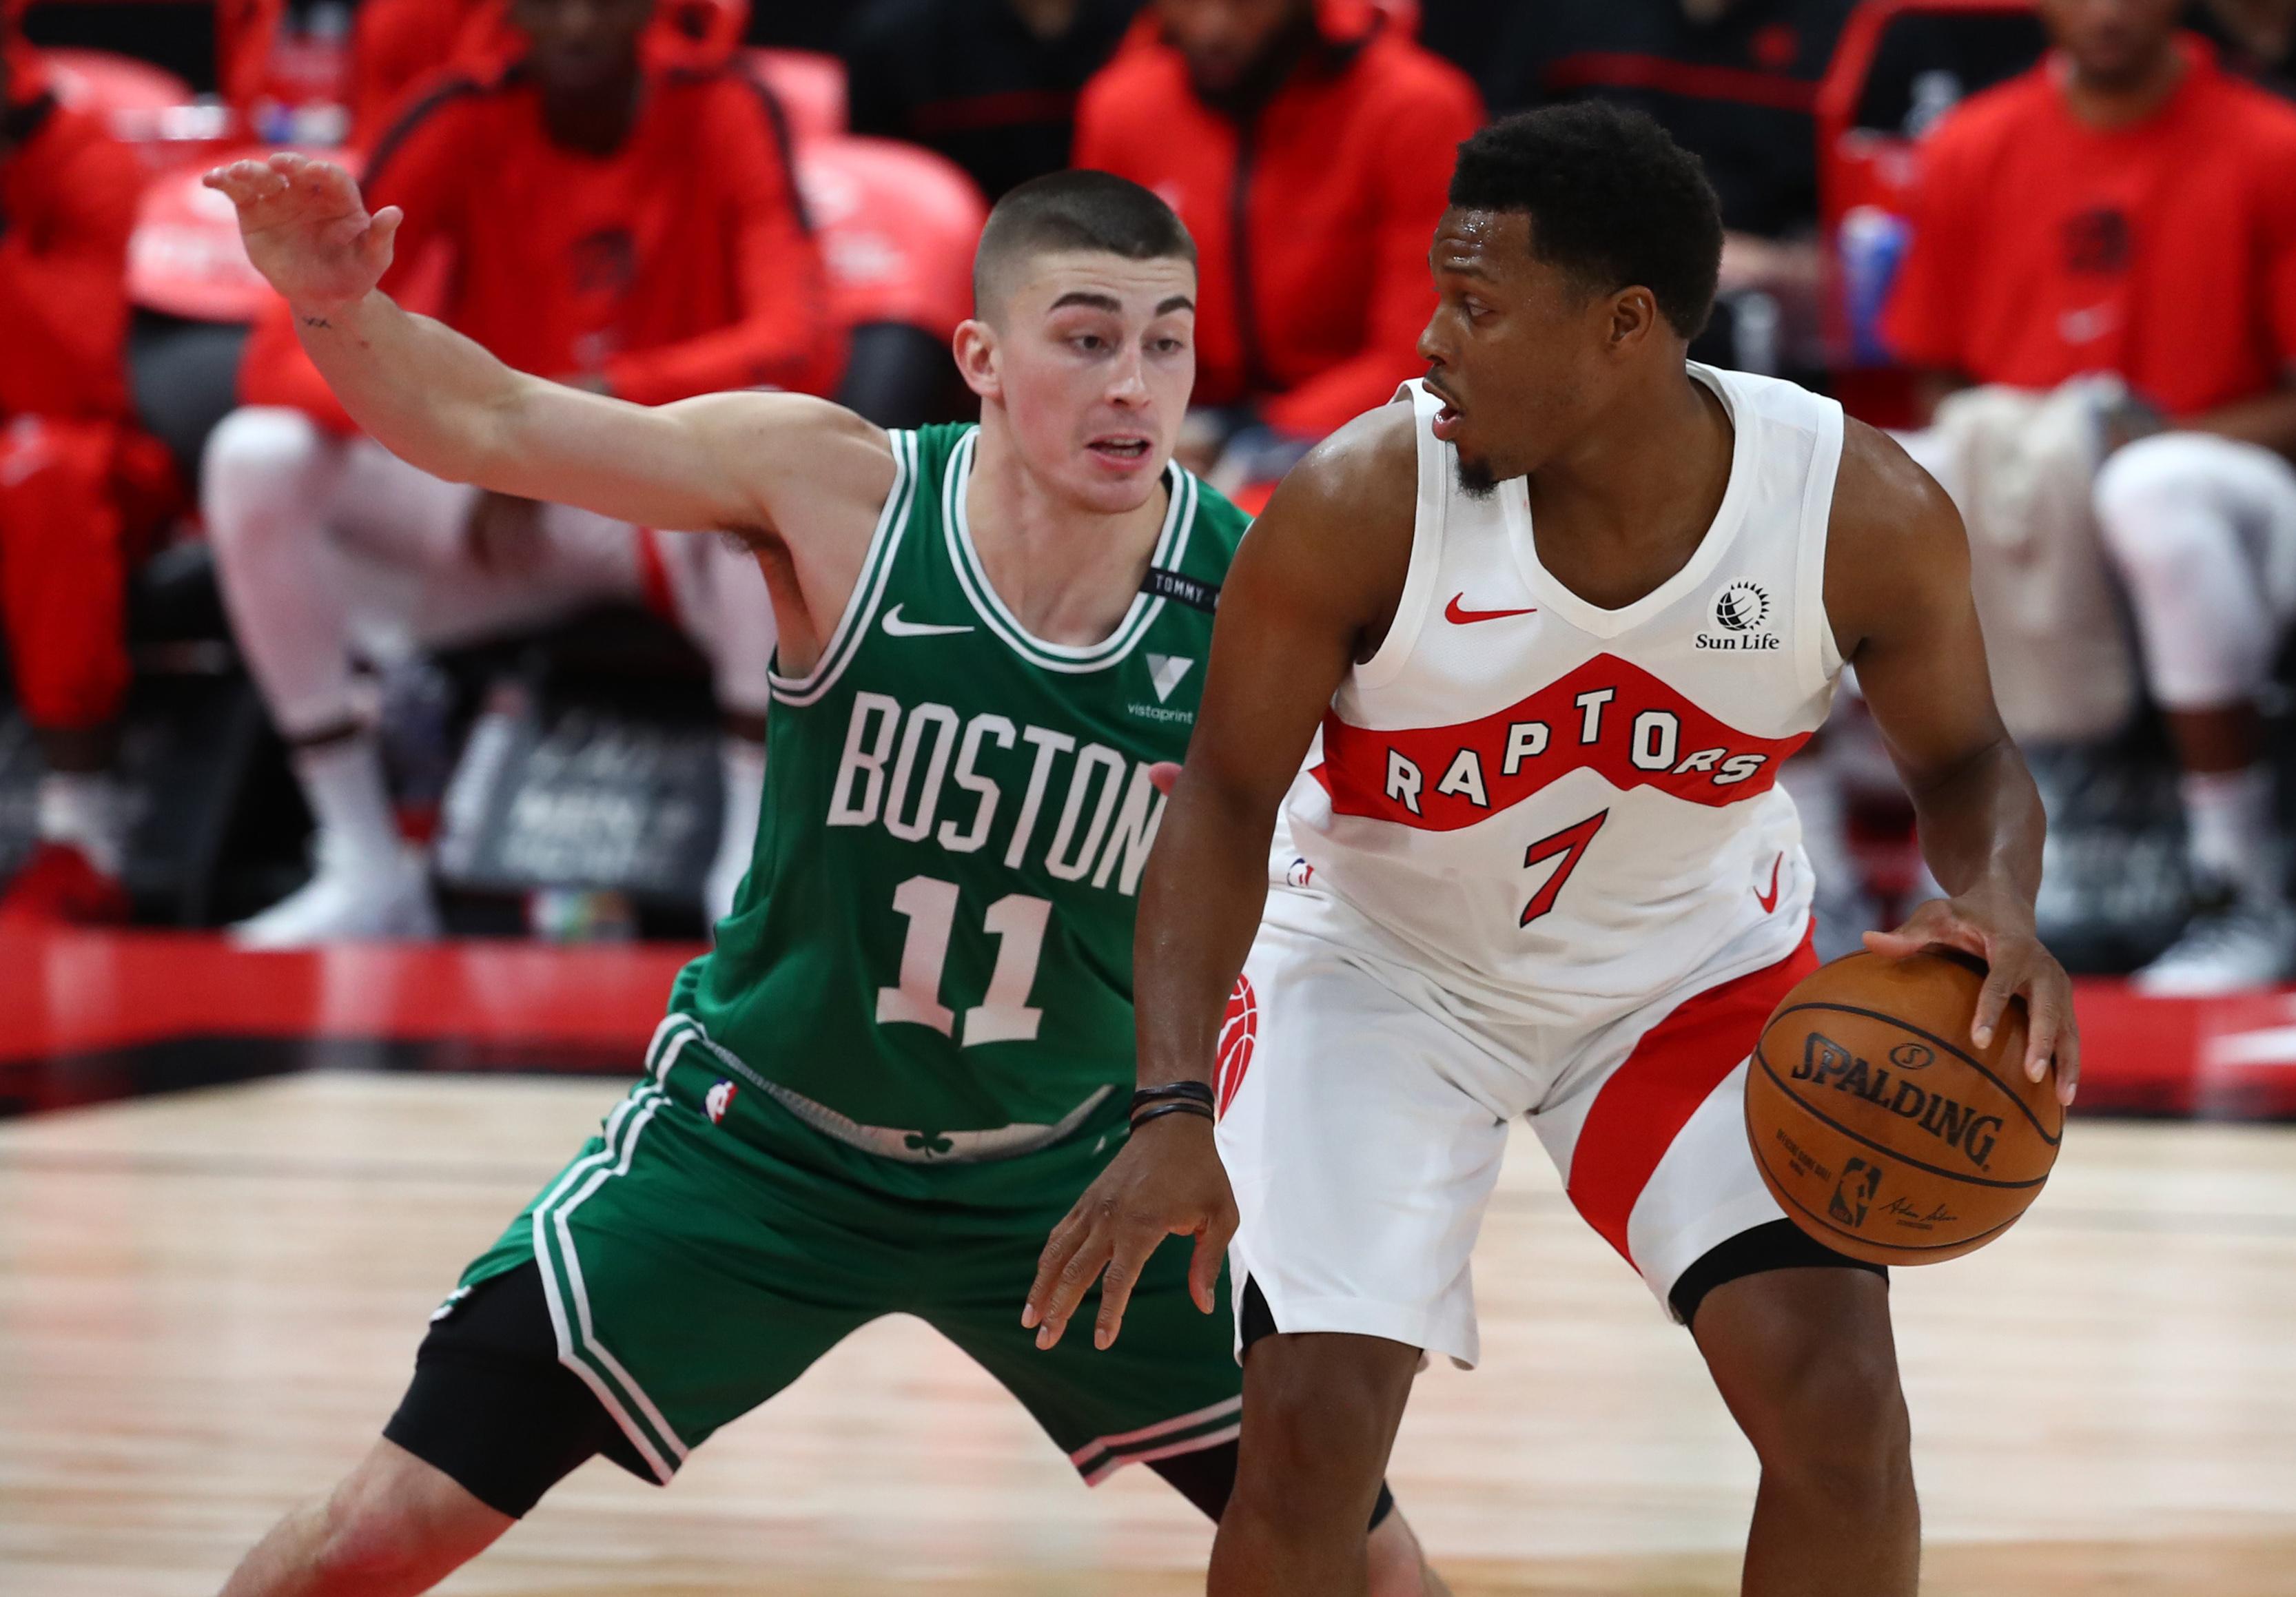 Payton Pritchard, PP, FastPP, fastpp, Boston Celtics